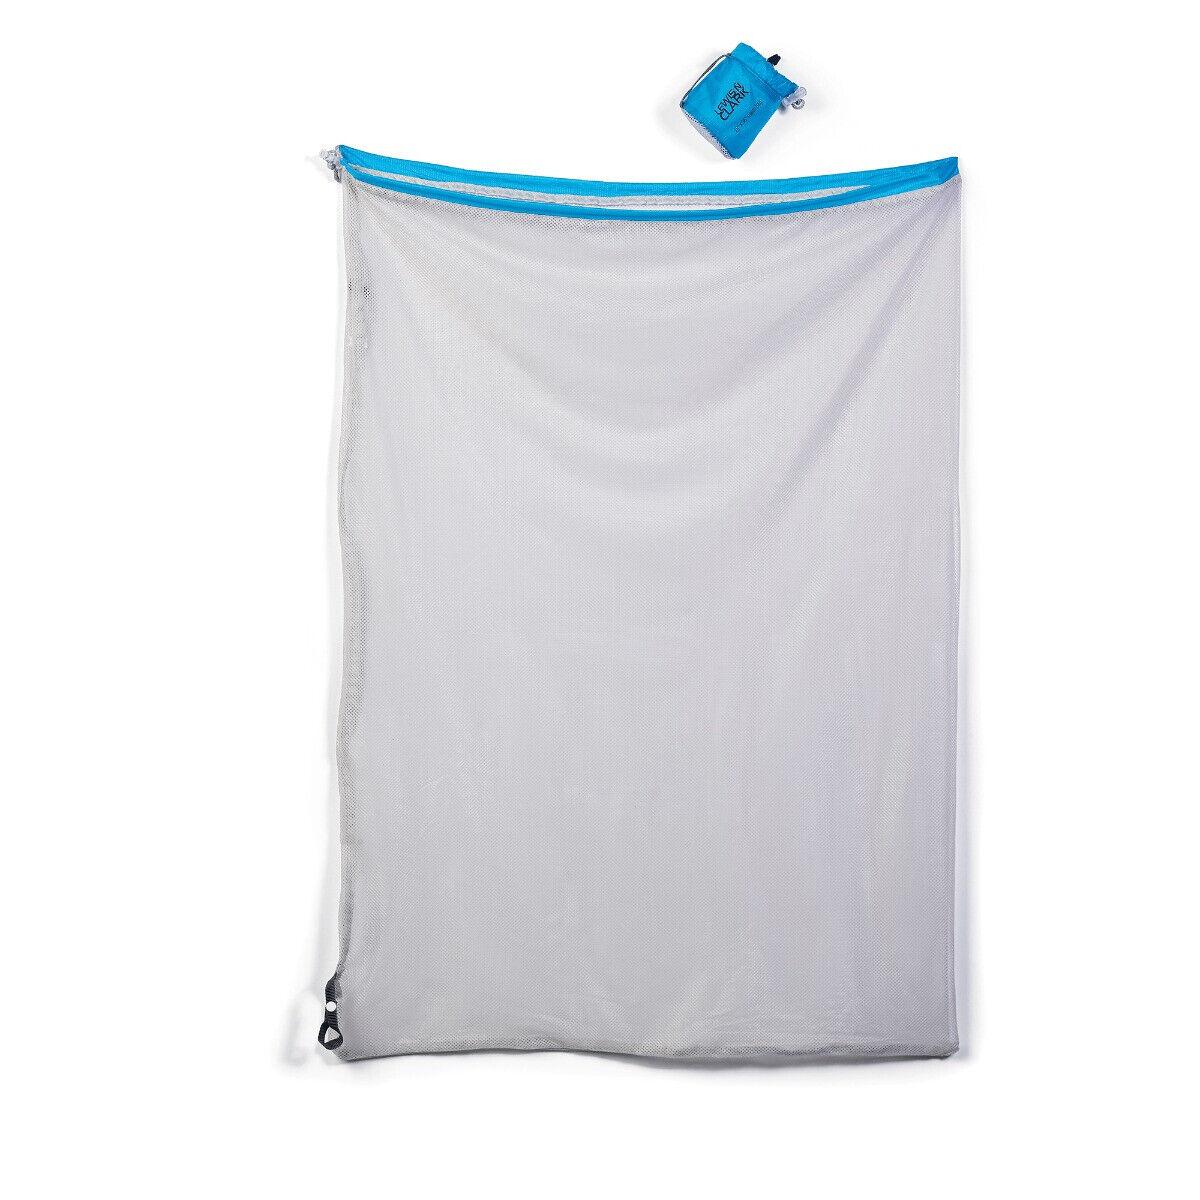 Lewis N Clark Diddy Bag 26x36 Electrolight Mesh Bag Combo Camping Hiking New - $14.99